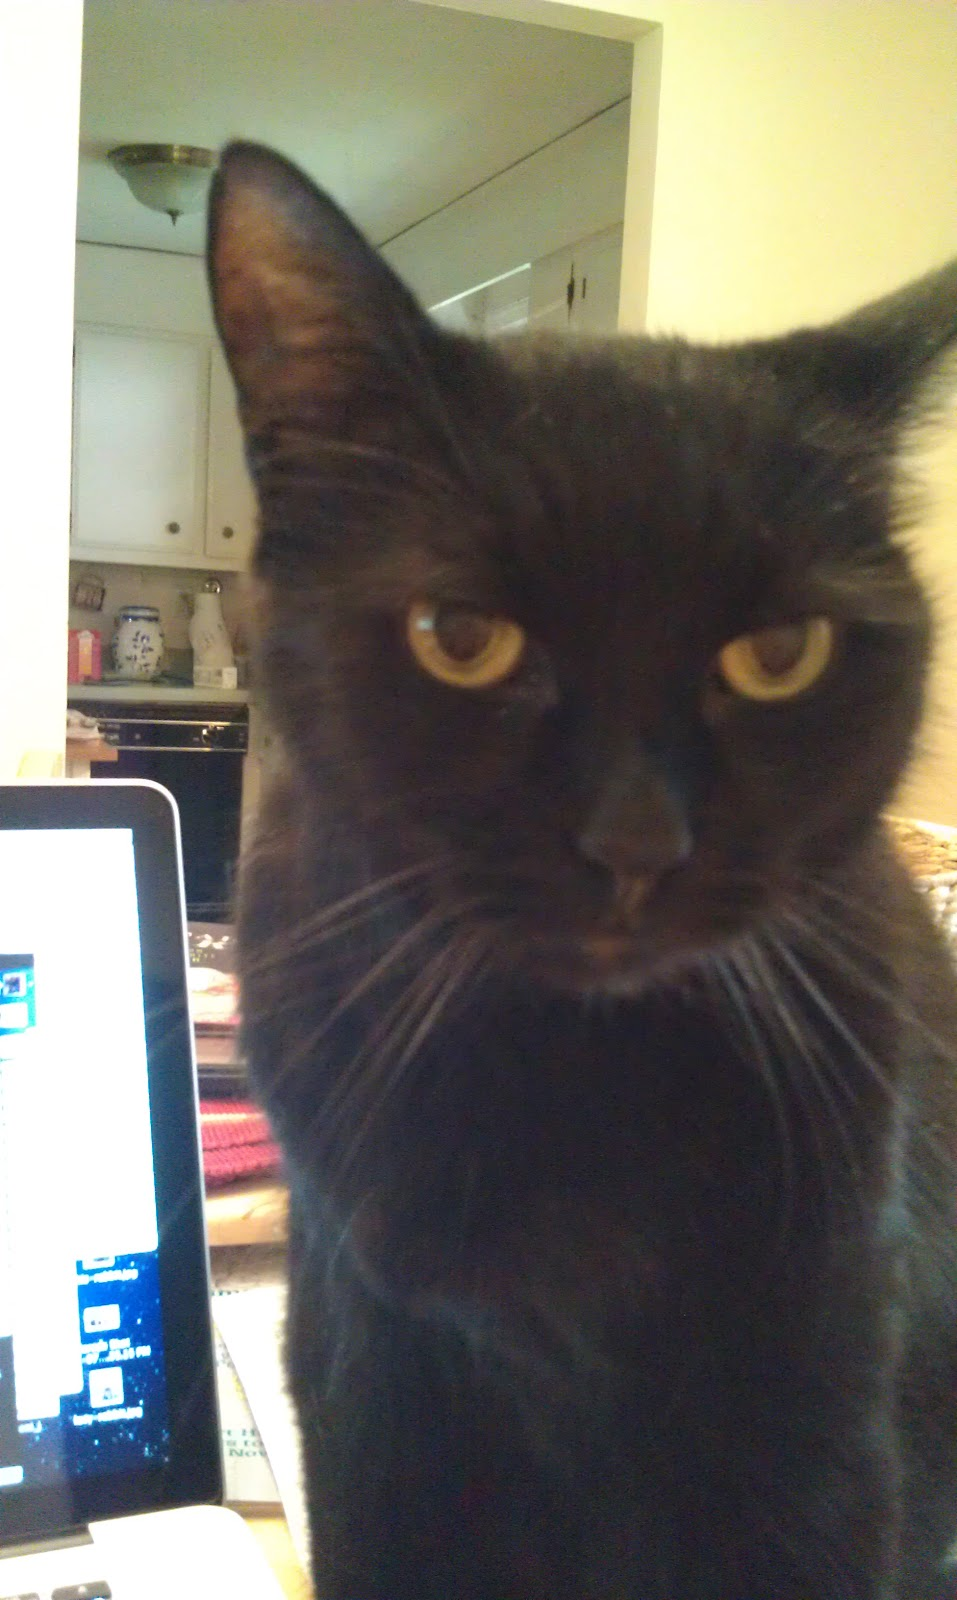 Cat Making Low Growling Noises